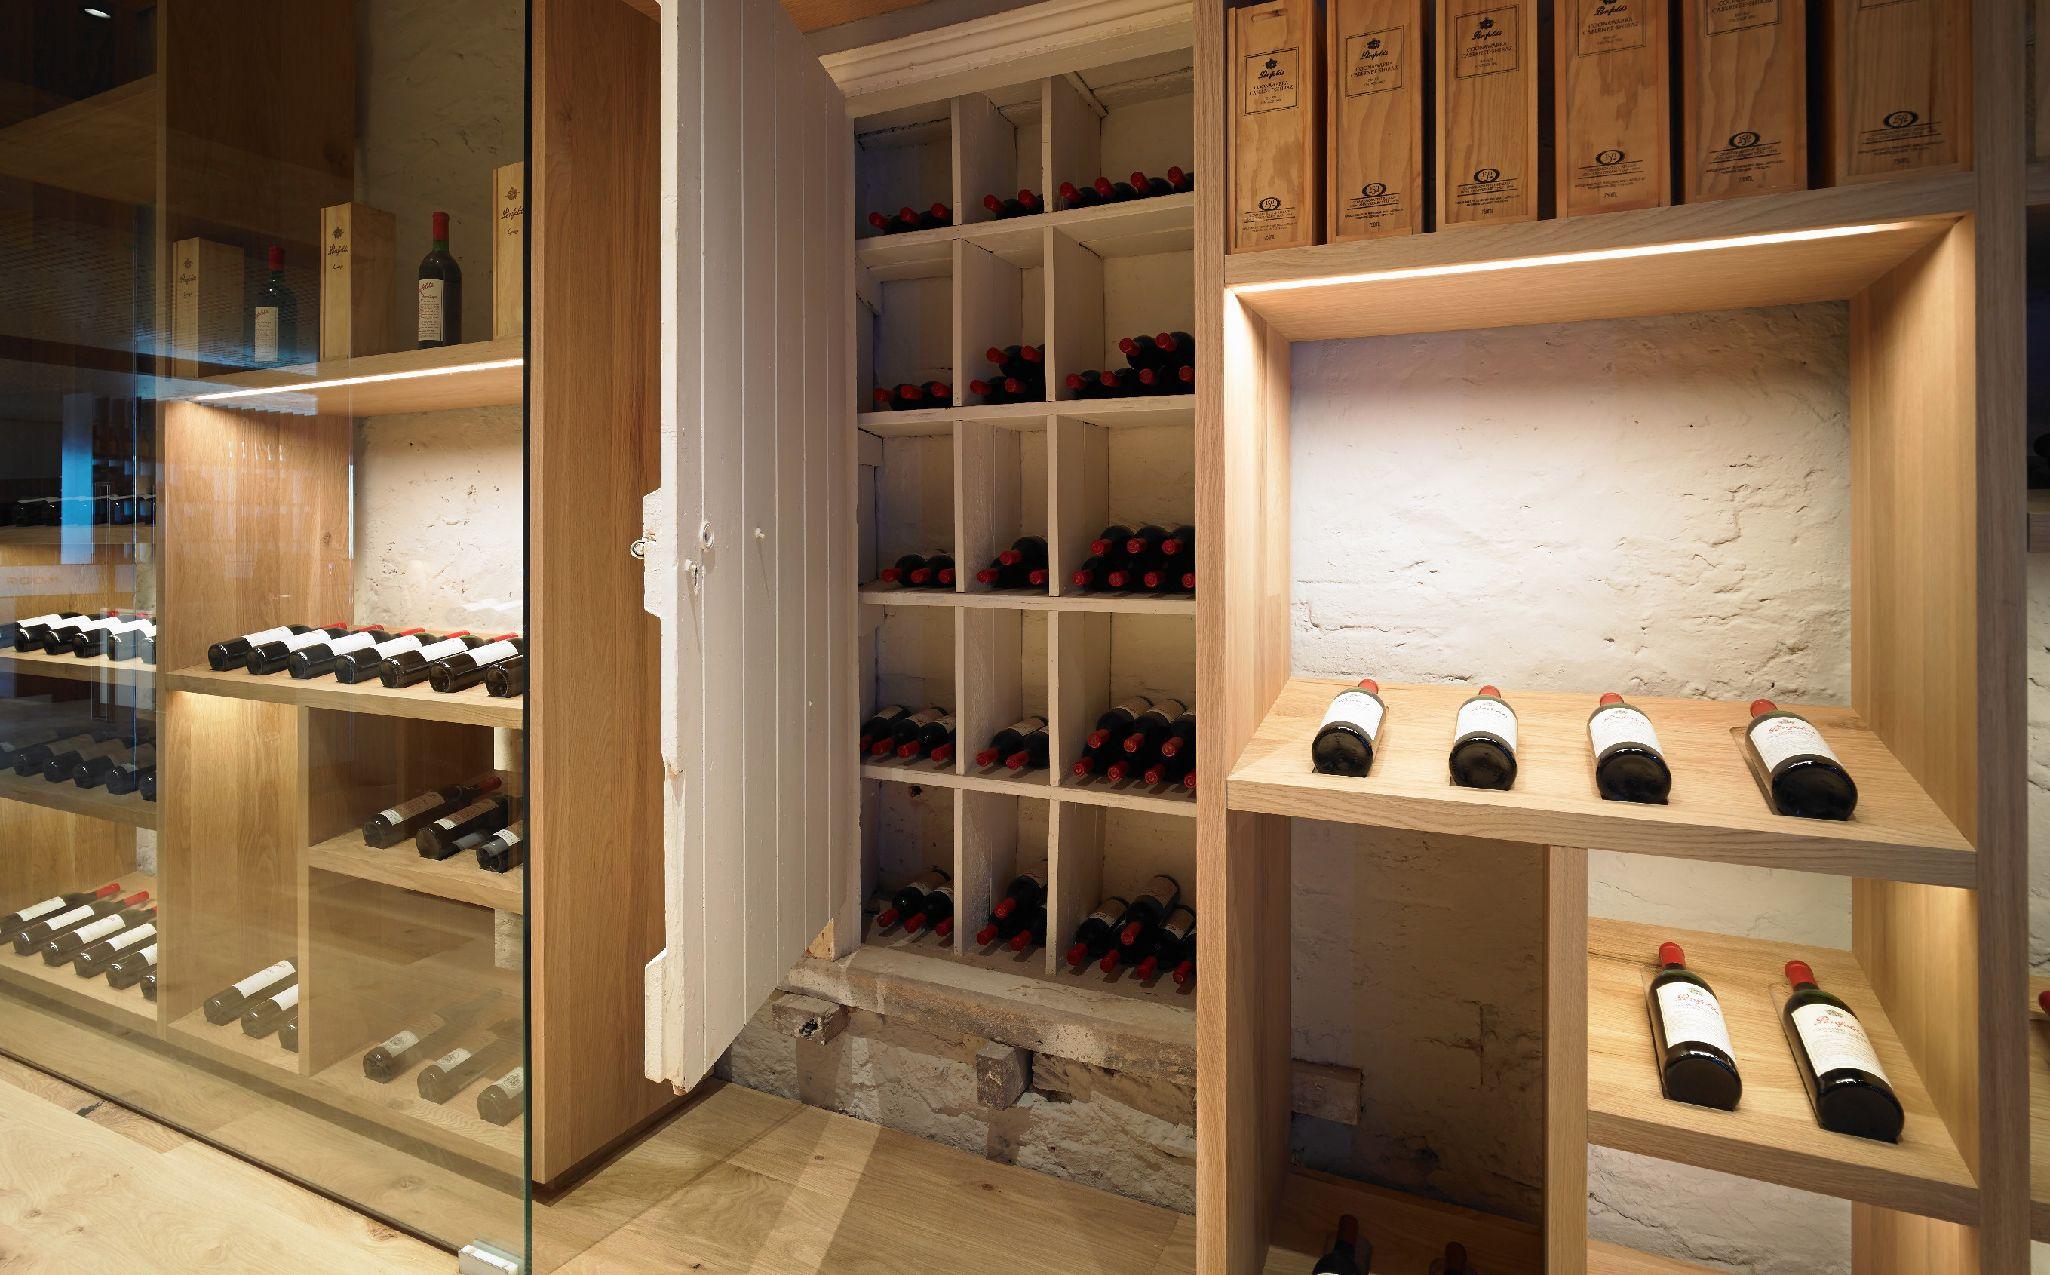 penfolds-winery-australia-luxury-travel